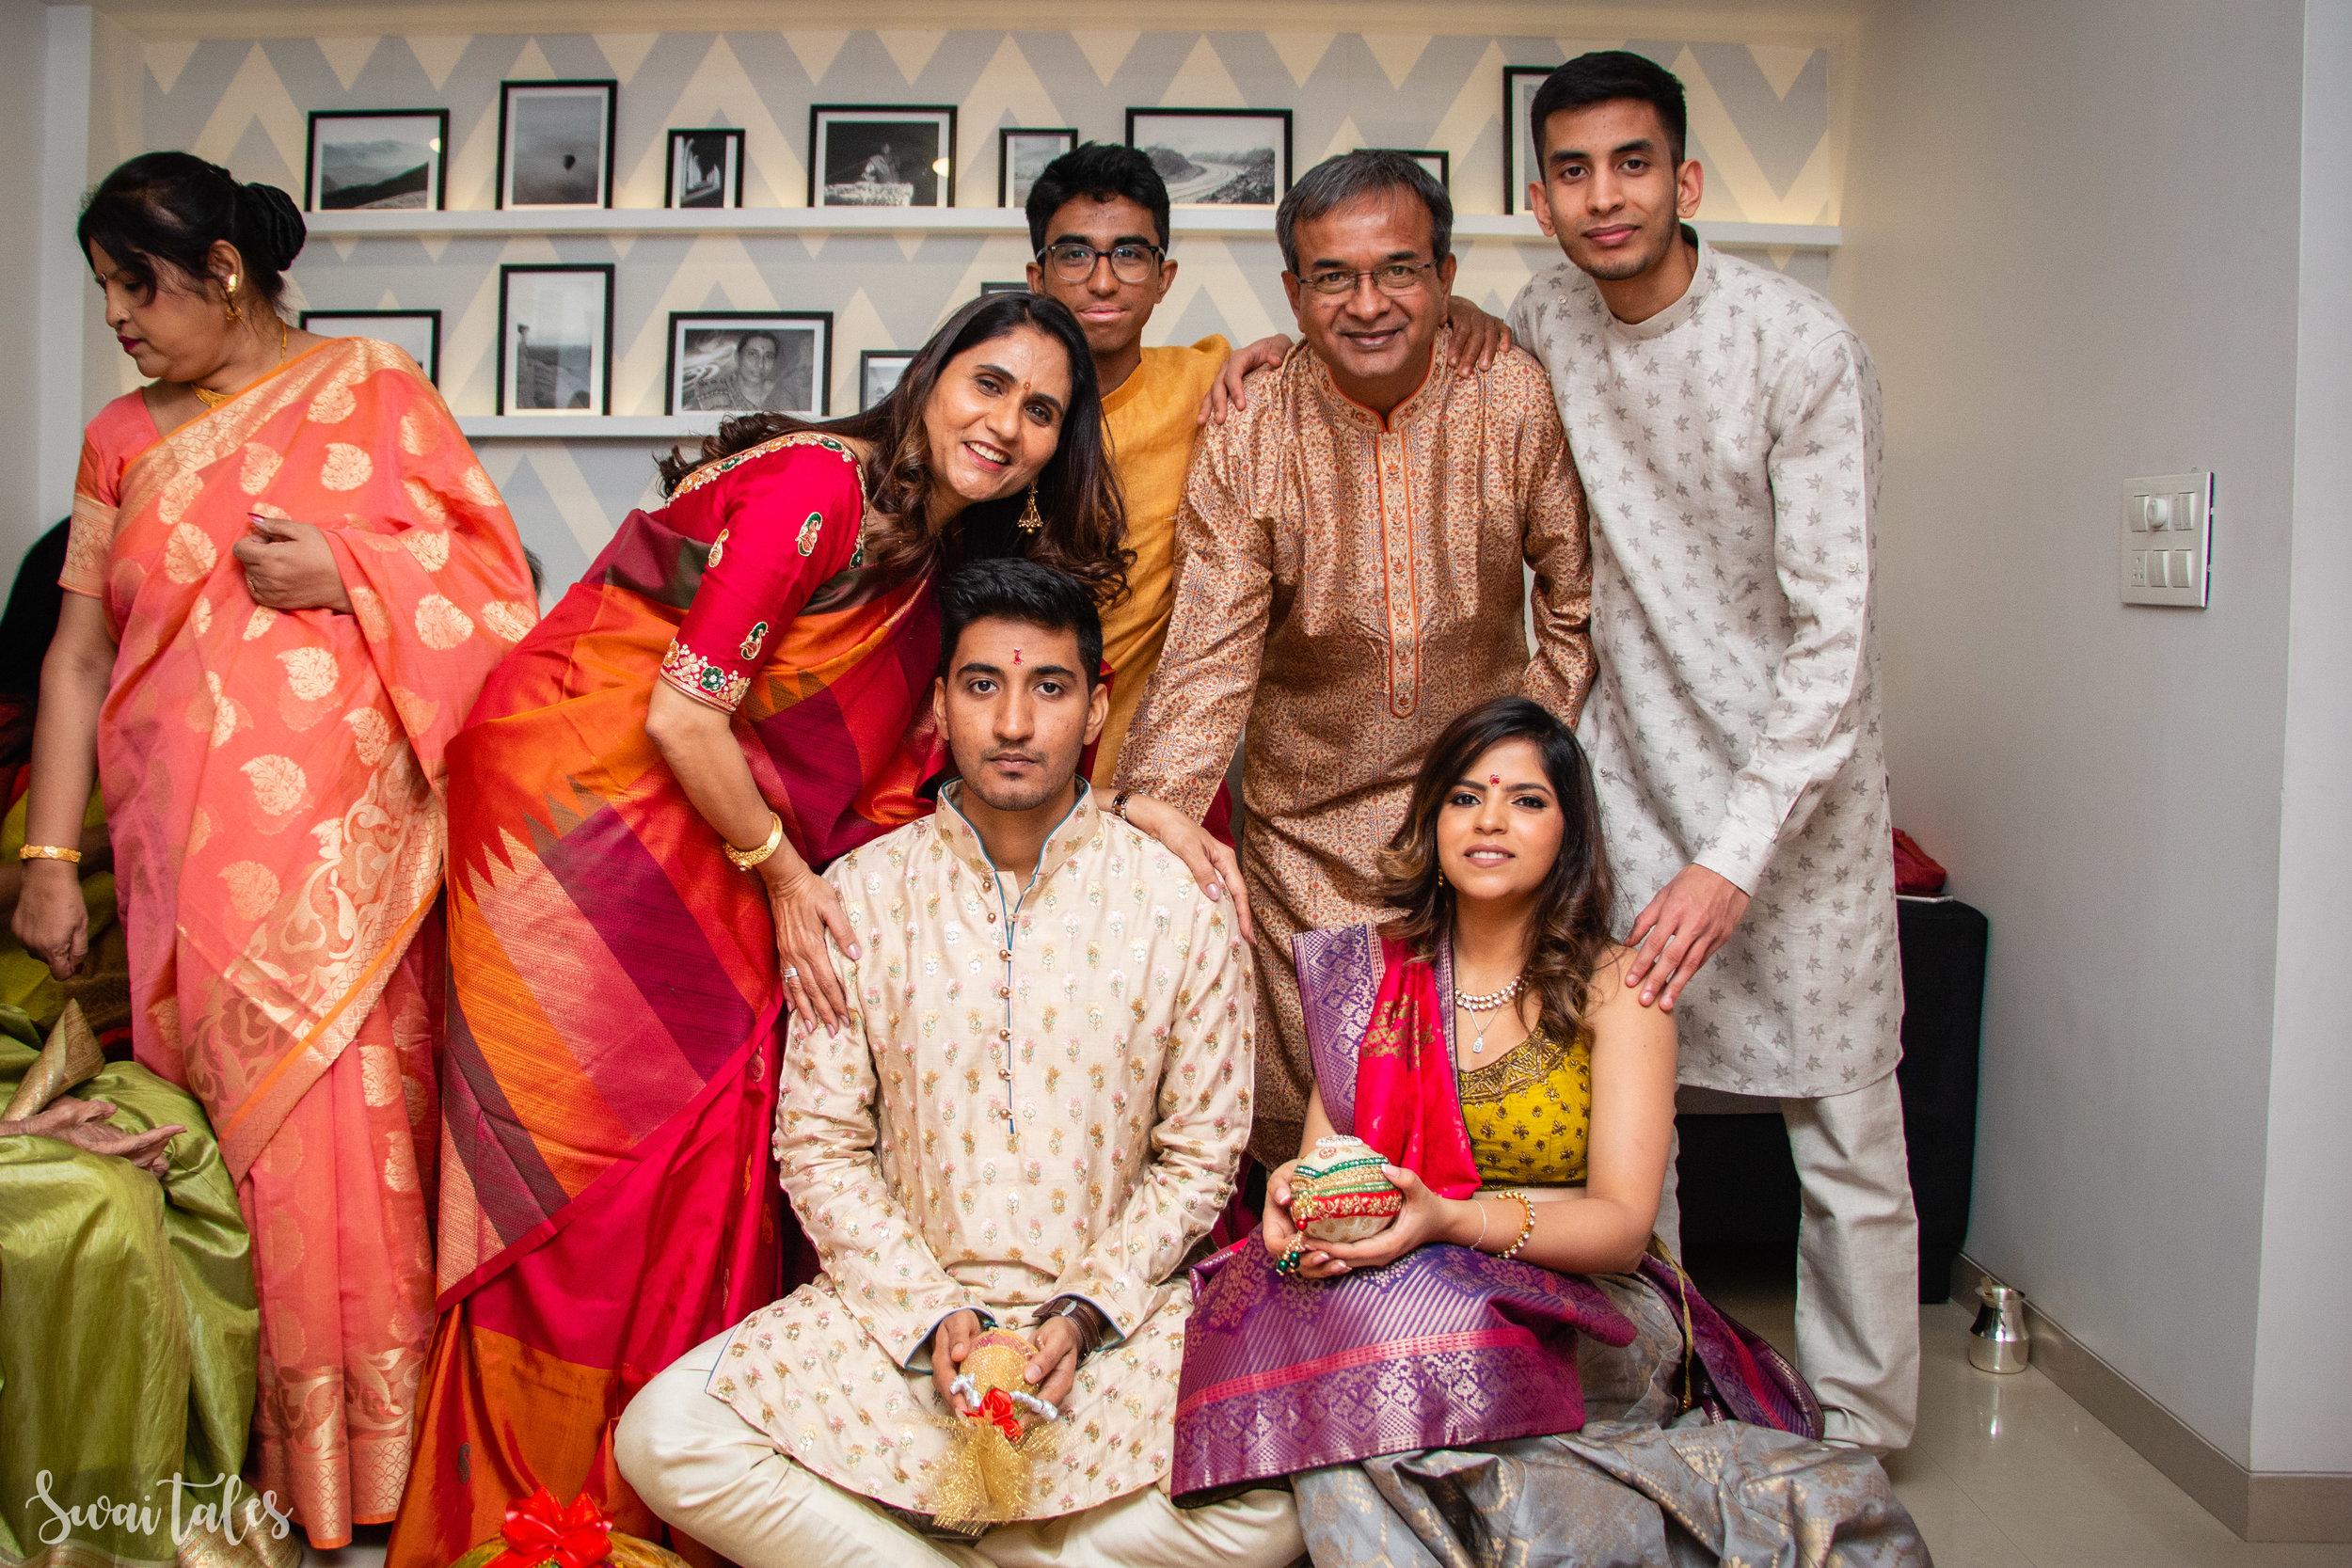 Sharmila & Sagar — swai tales